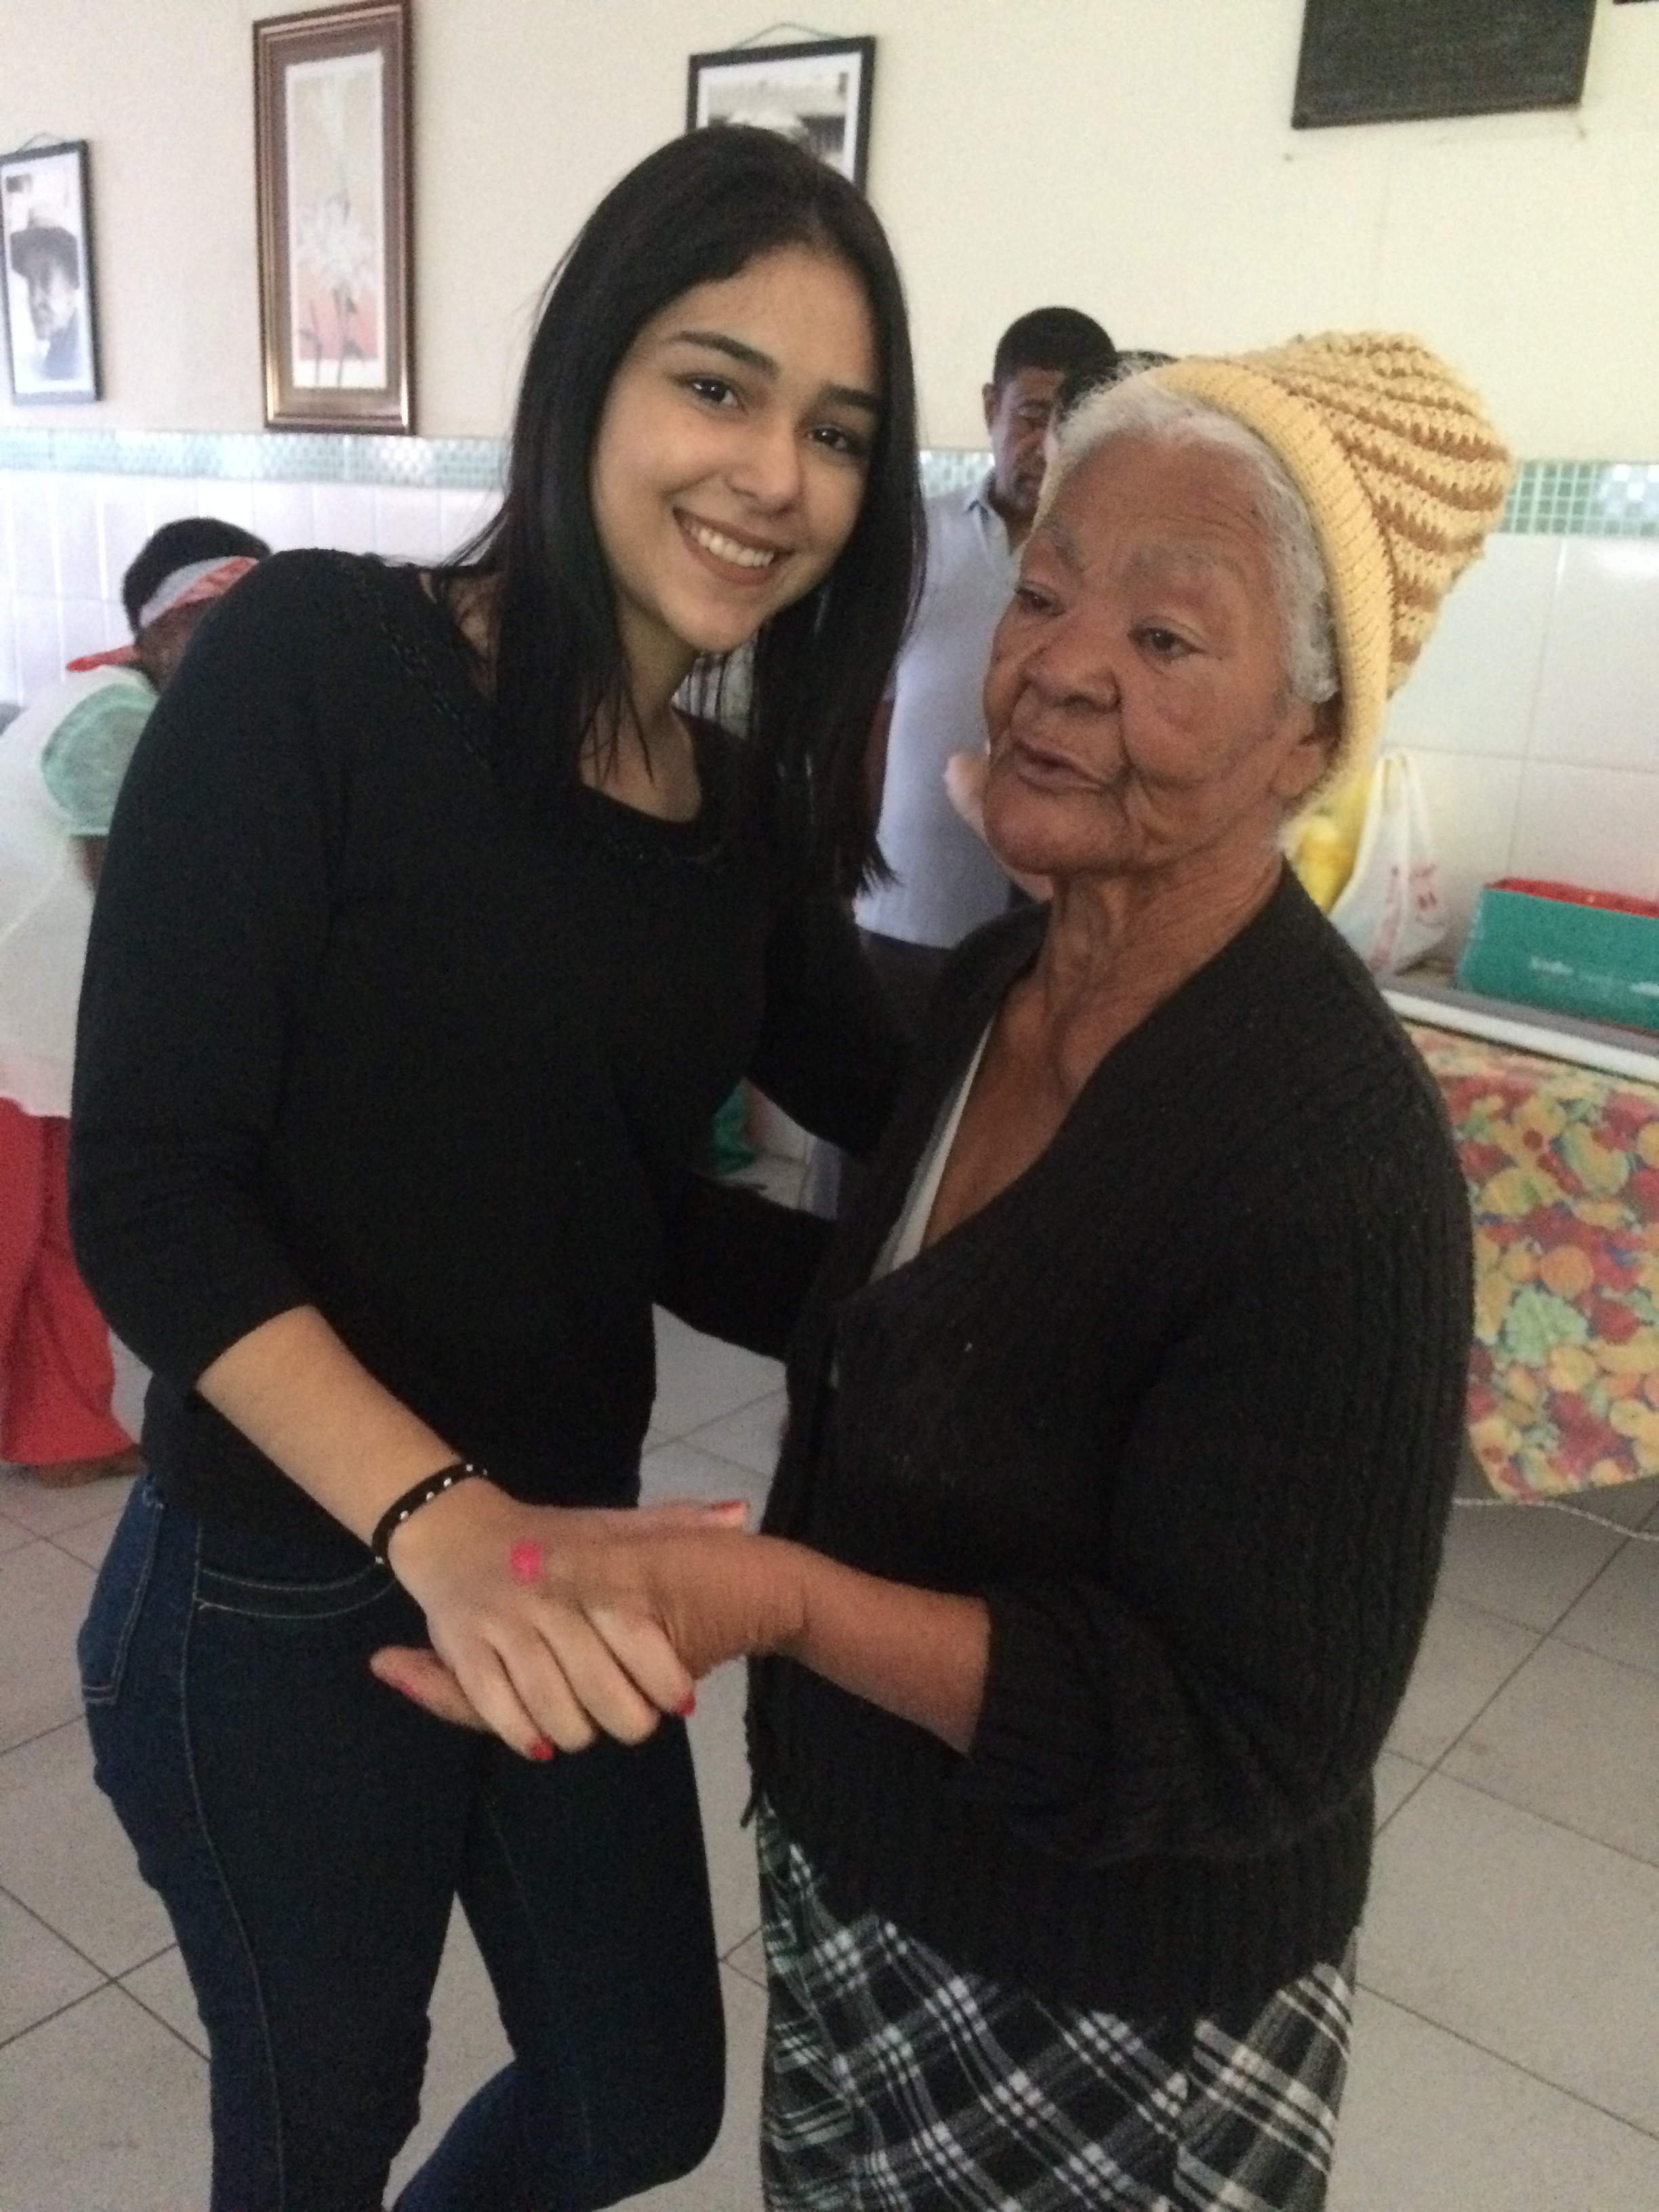 Uma data dedicada aos idosos